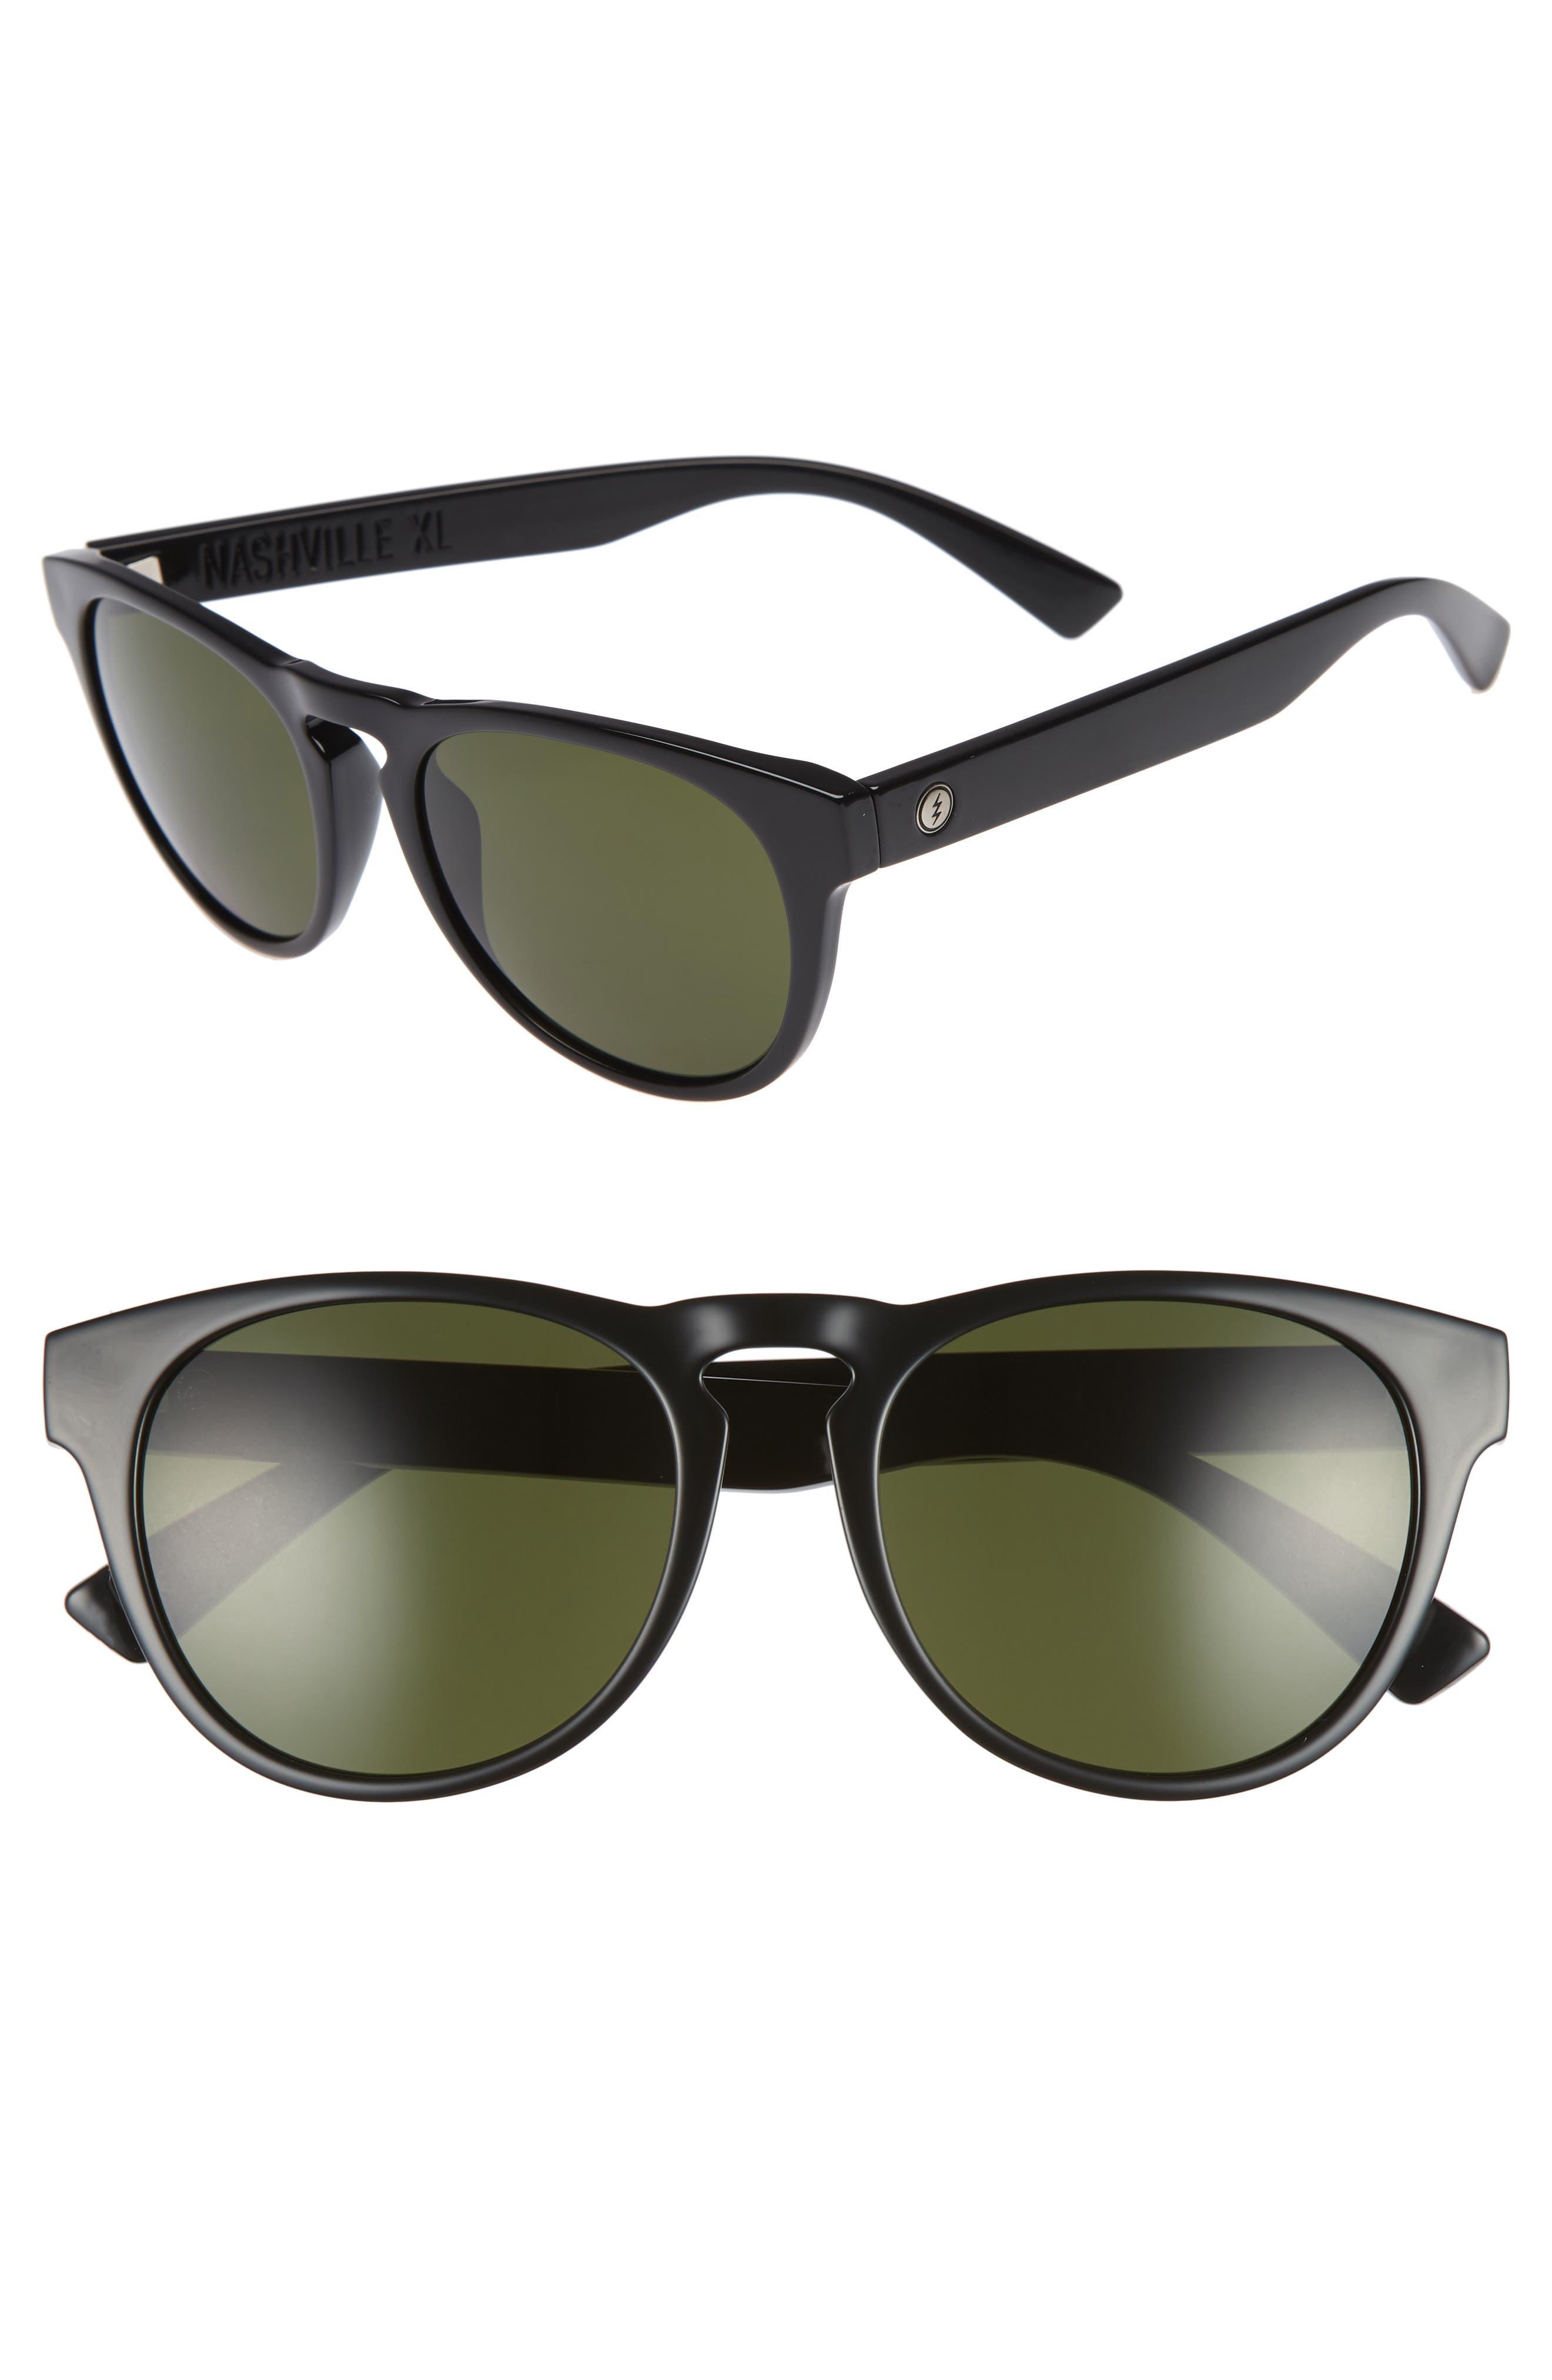 Nashville XL 52mm Melanin Infused Sunglasses,                             Main thumbnail 1, color,                             GLOSS BLACK/ GREY